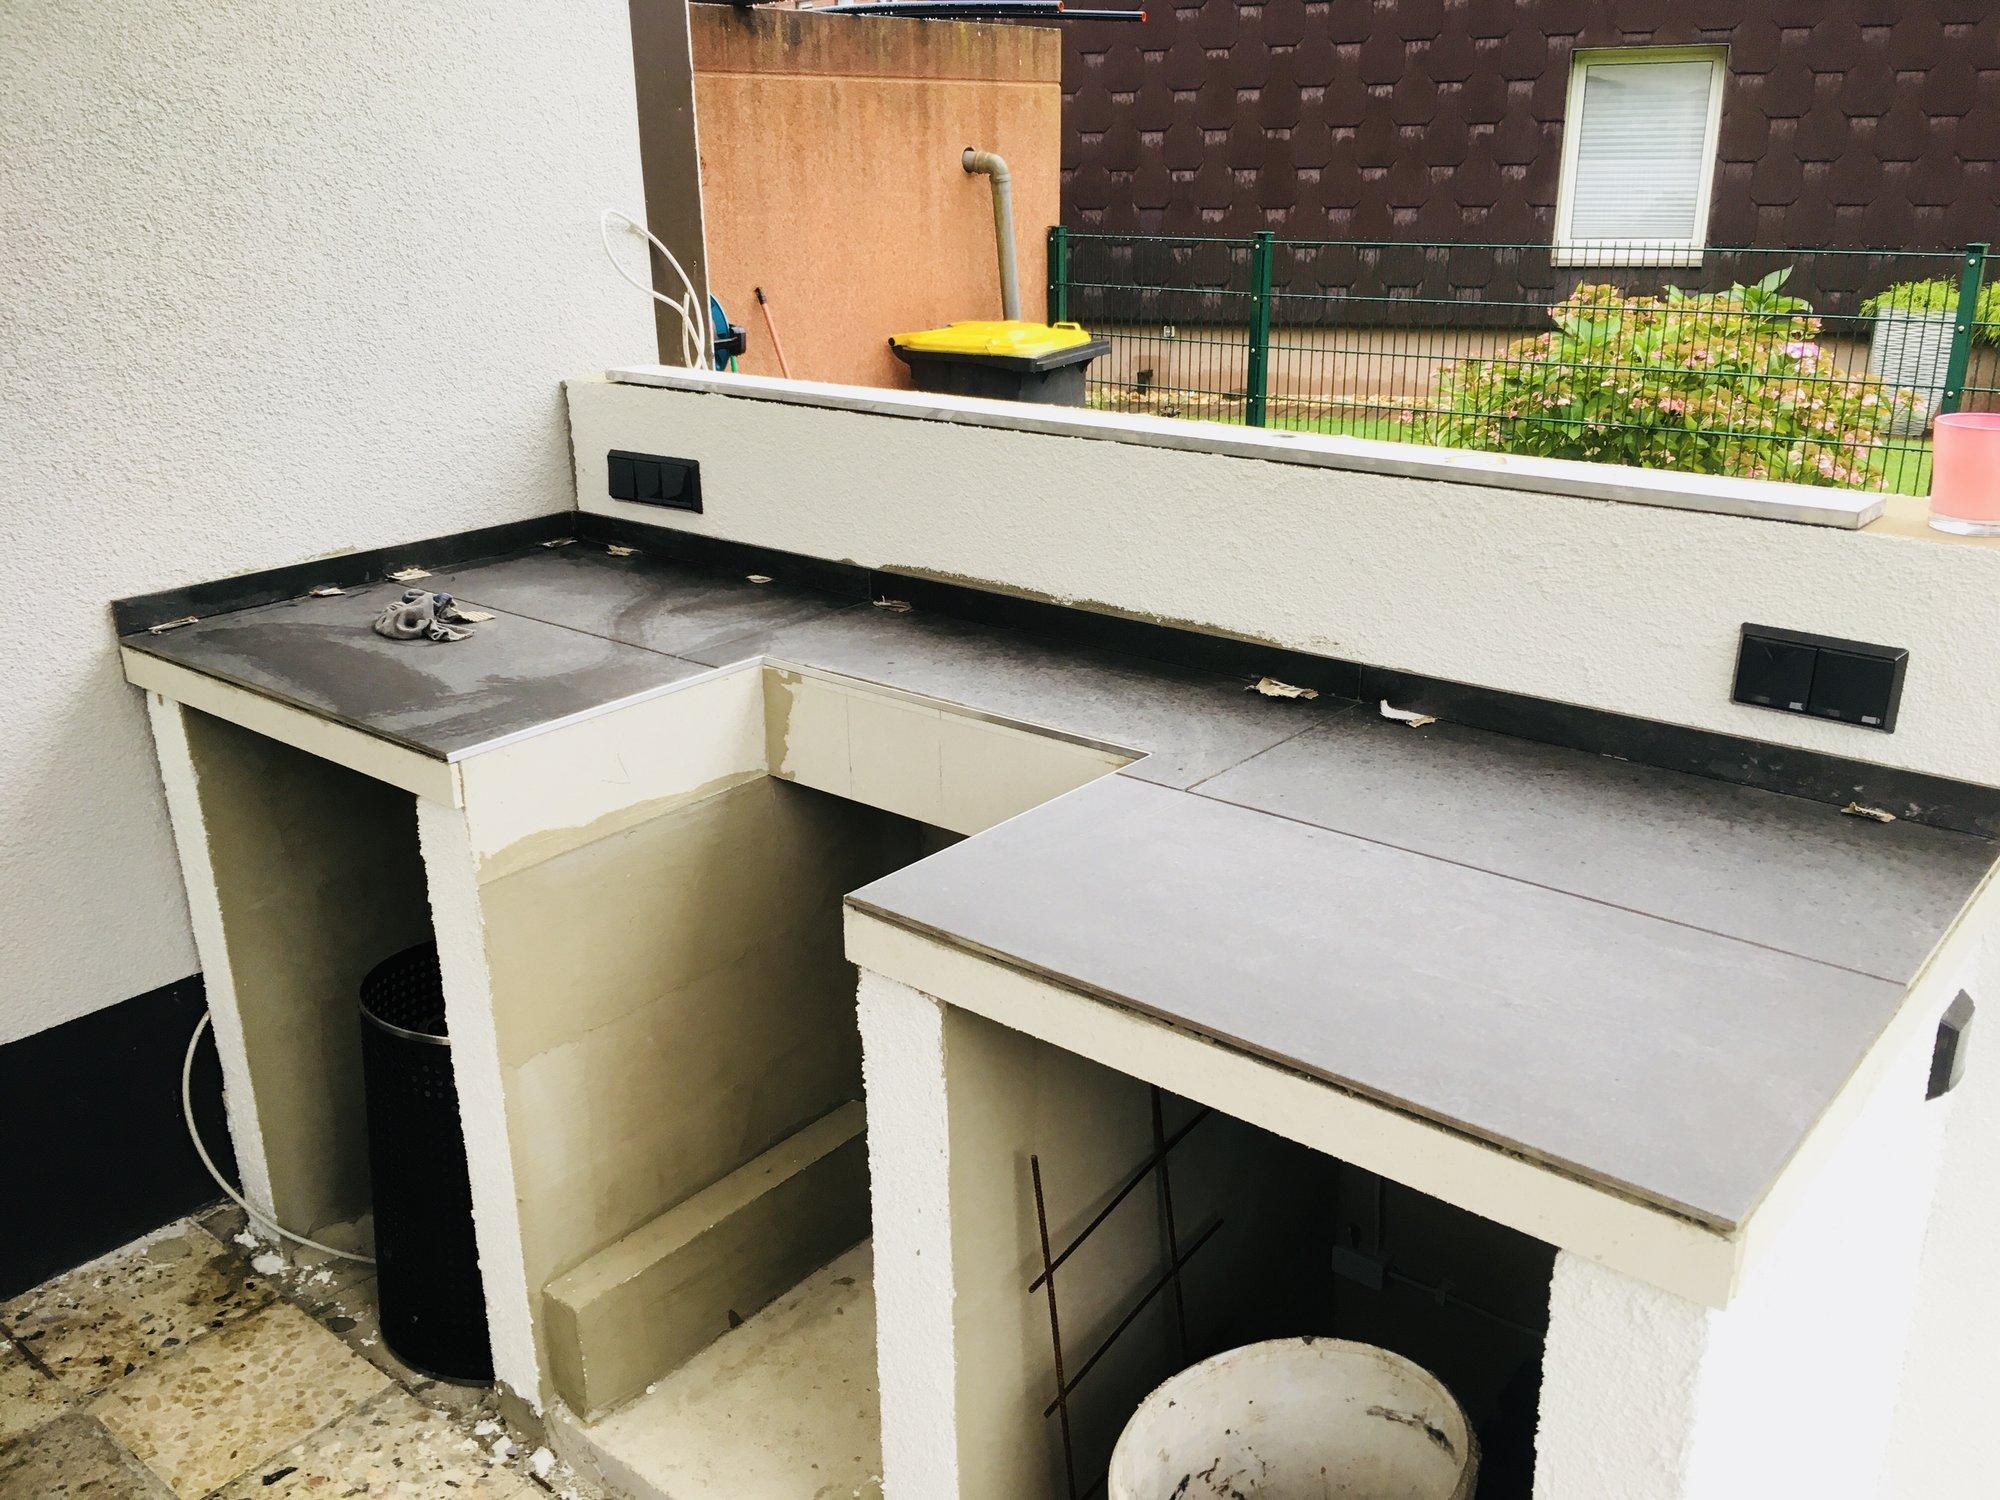 Weber Outdoor Küche Bauen : Wunderbar ideen für outdoor küche selber bauen paletten